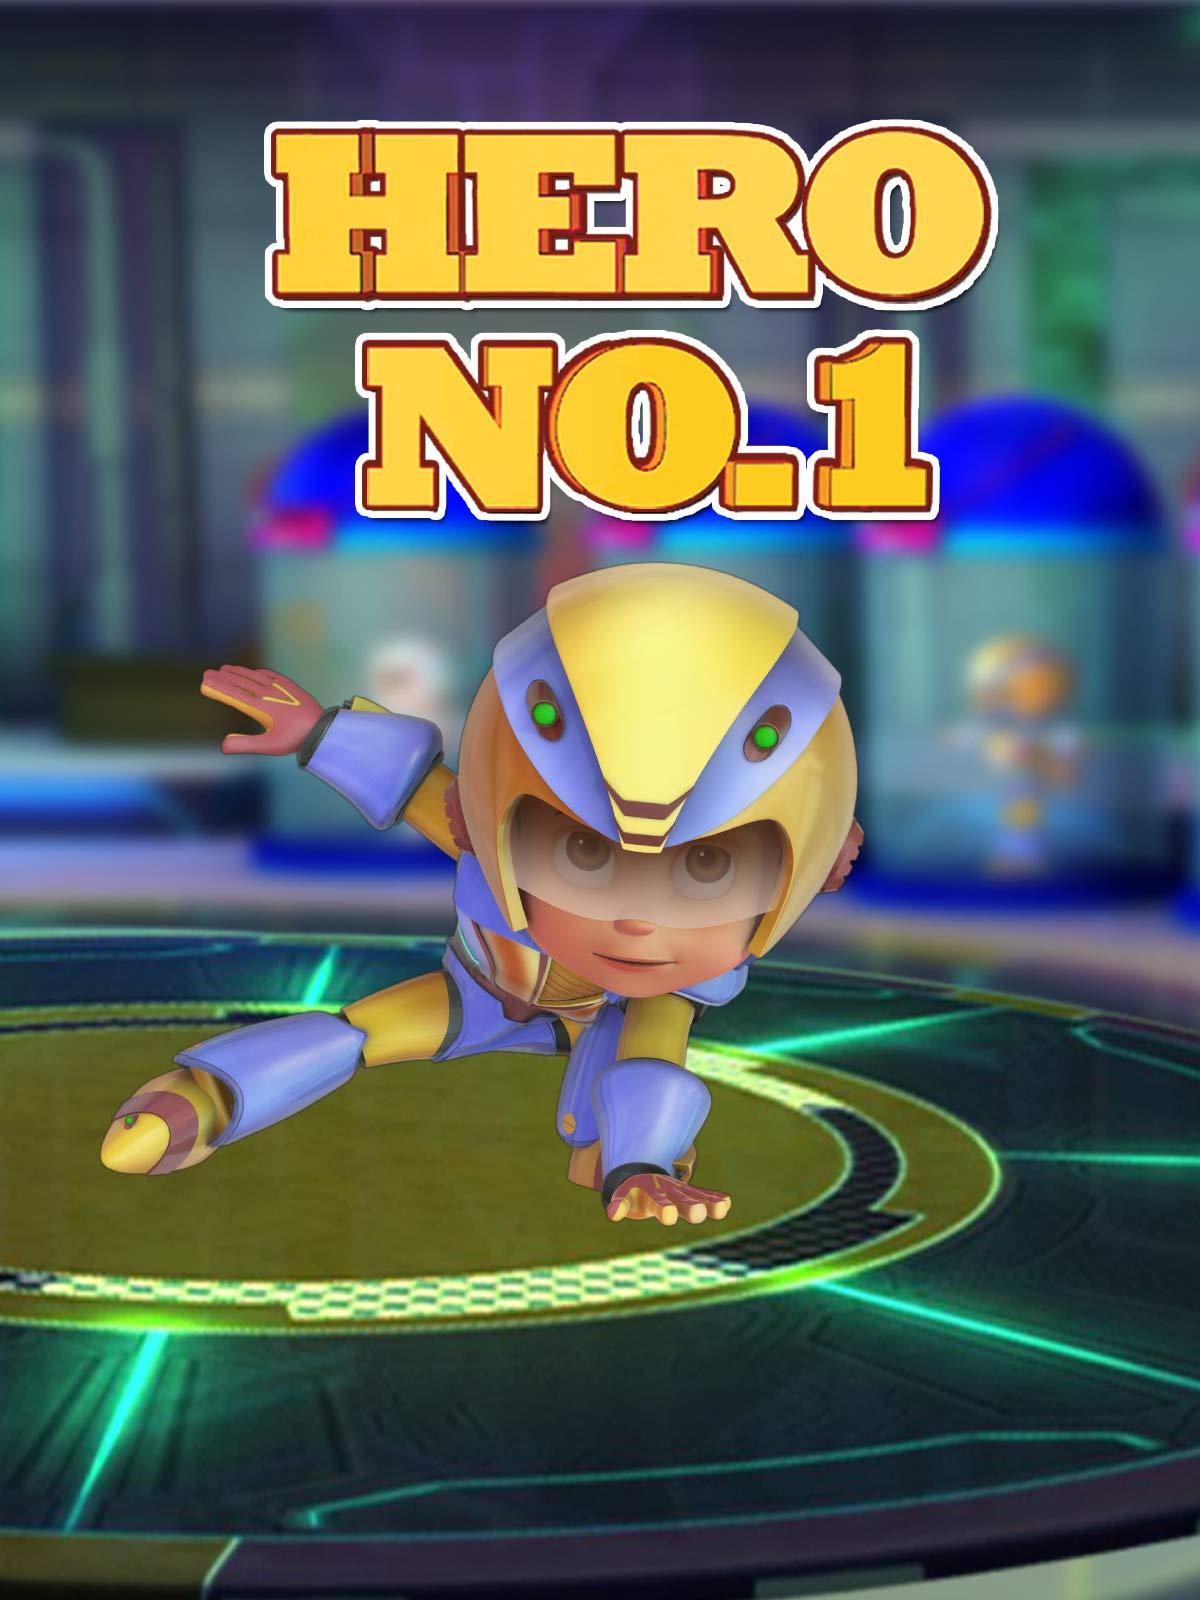 Hero No.01 - Vir: The Robot Boy Movie